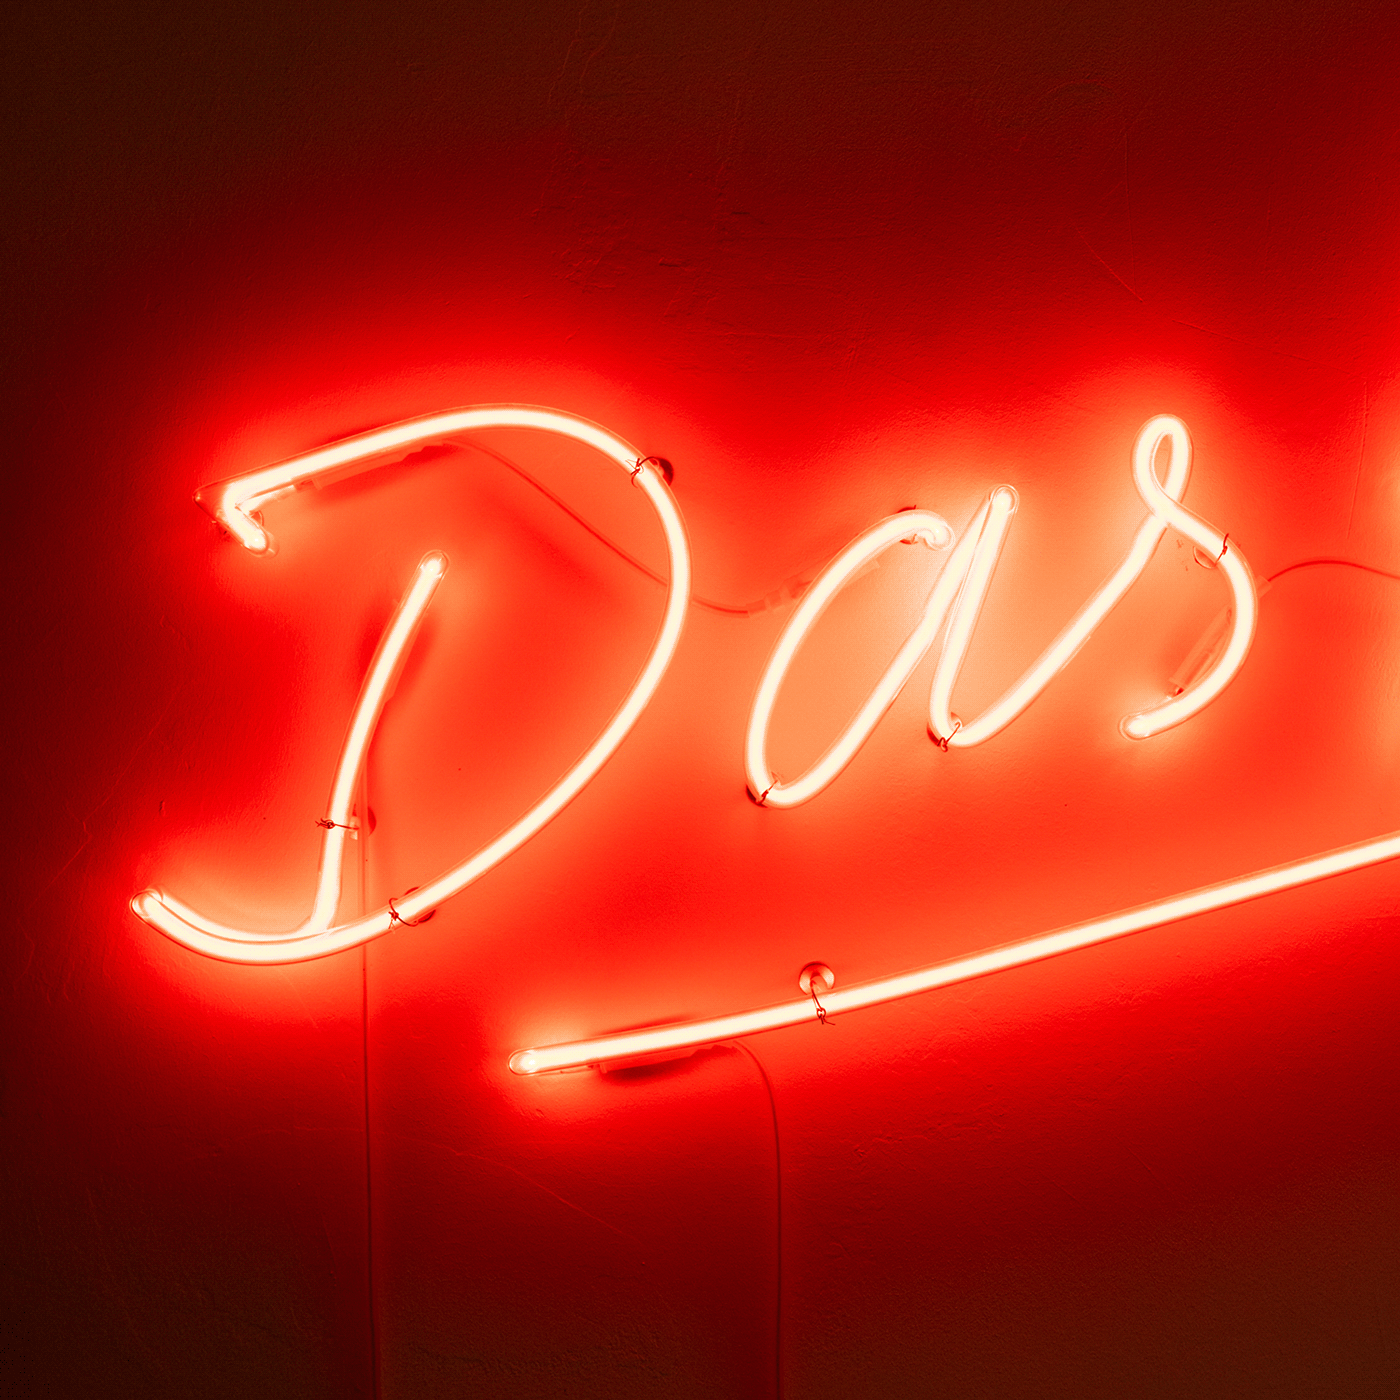 customtype Handlettering lettering neon neonsign oldschool Retro Signage type